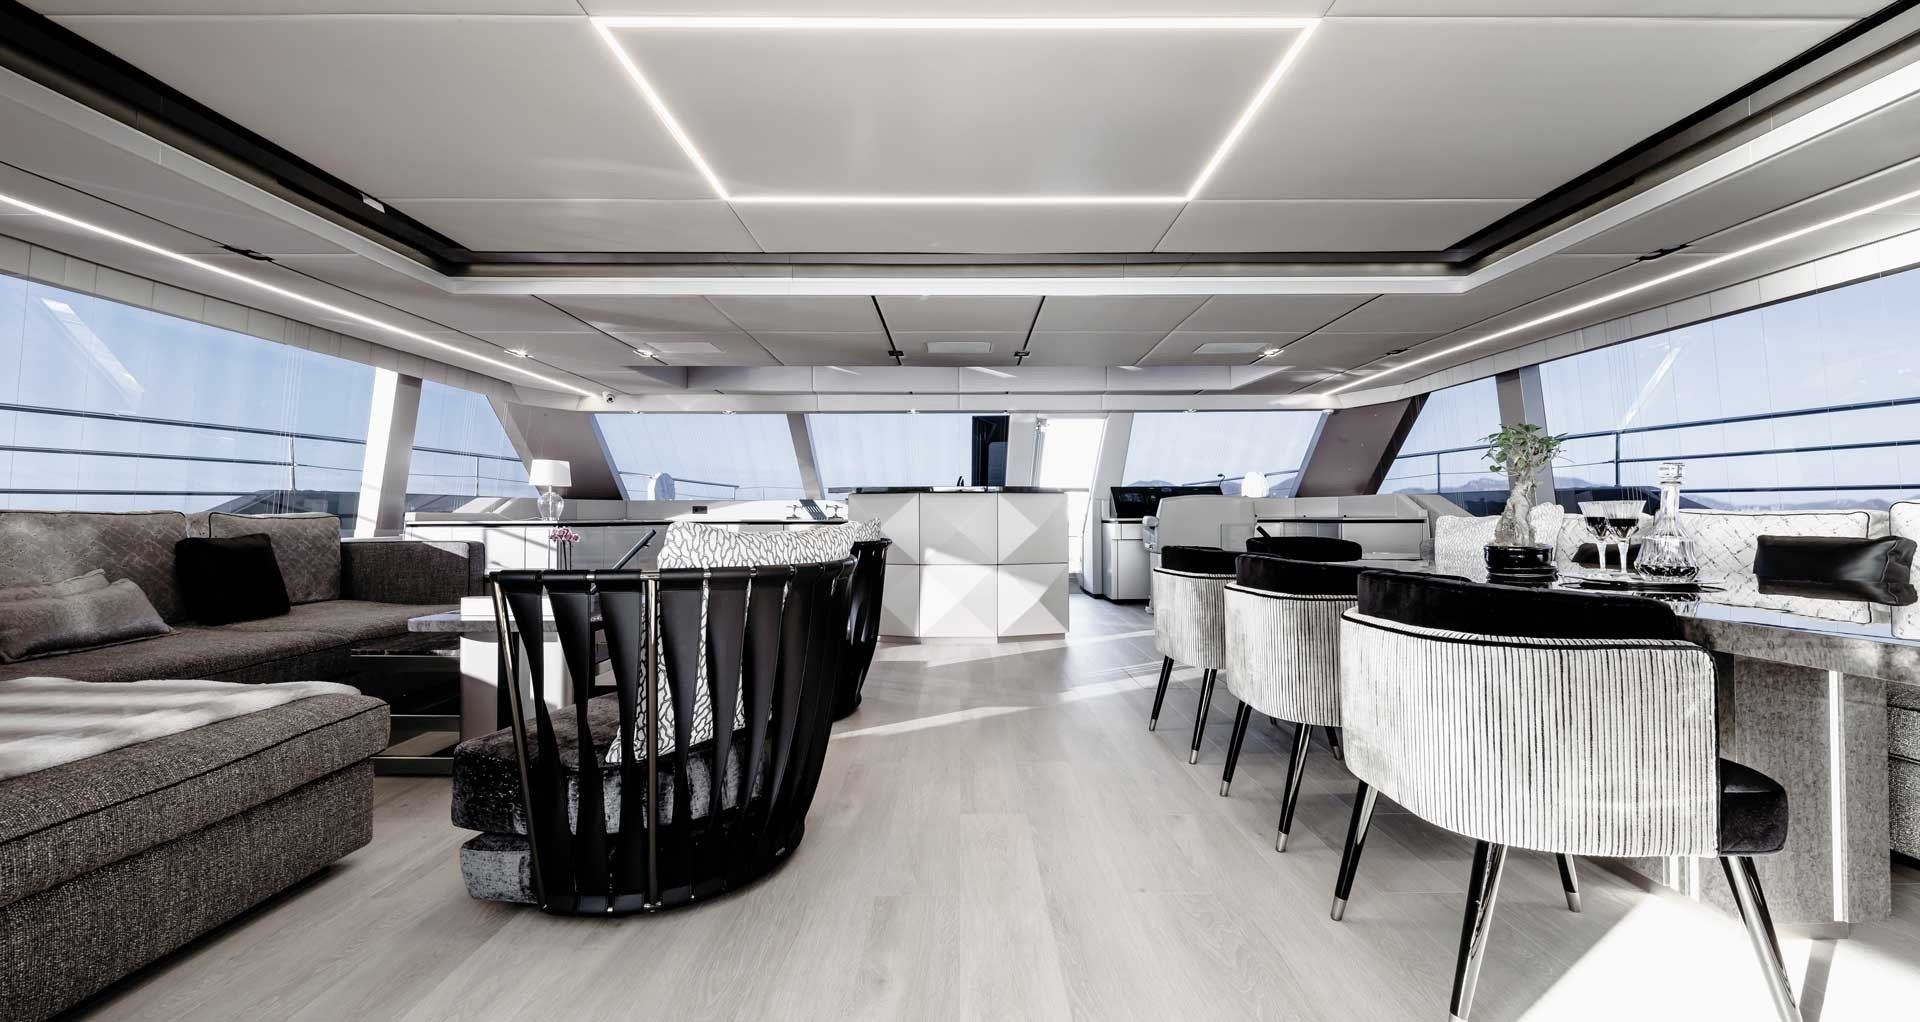 New Power Catamaran for Sale  Sunreef 80 Power Eco Layout & Accommodations